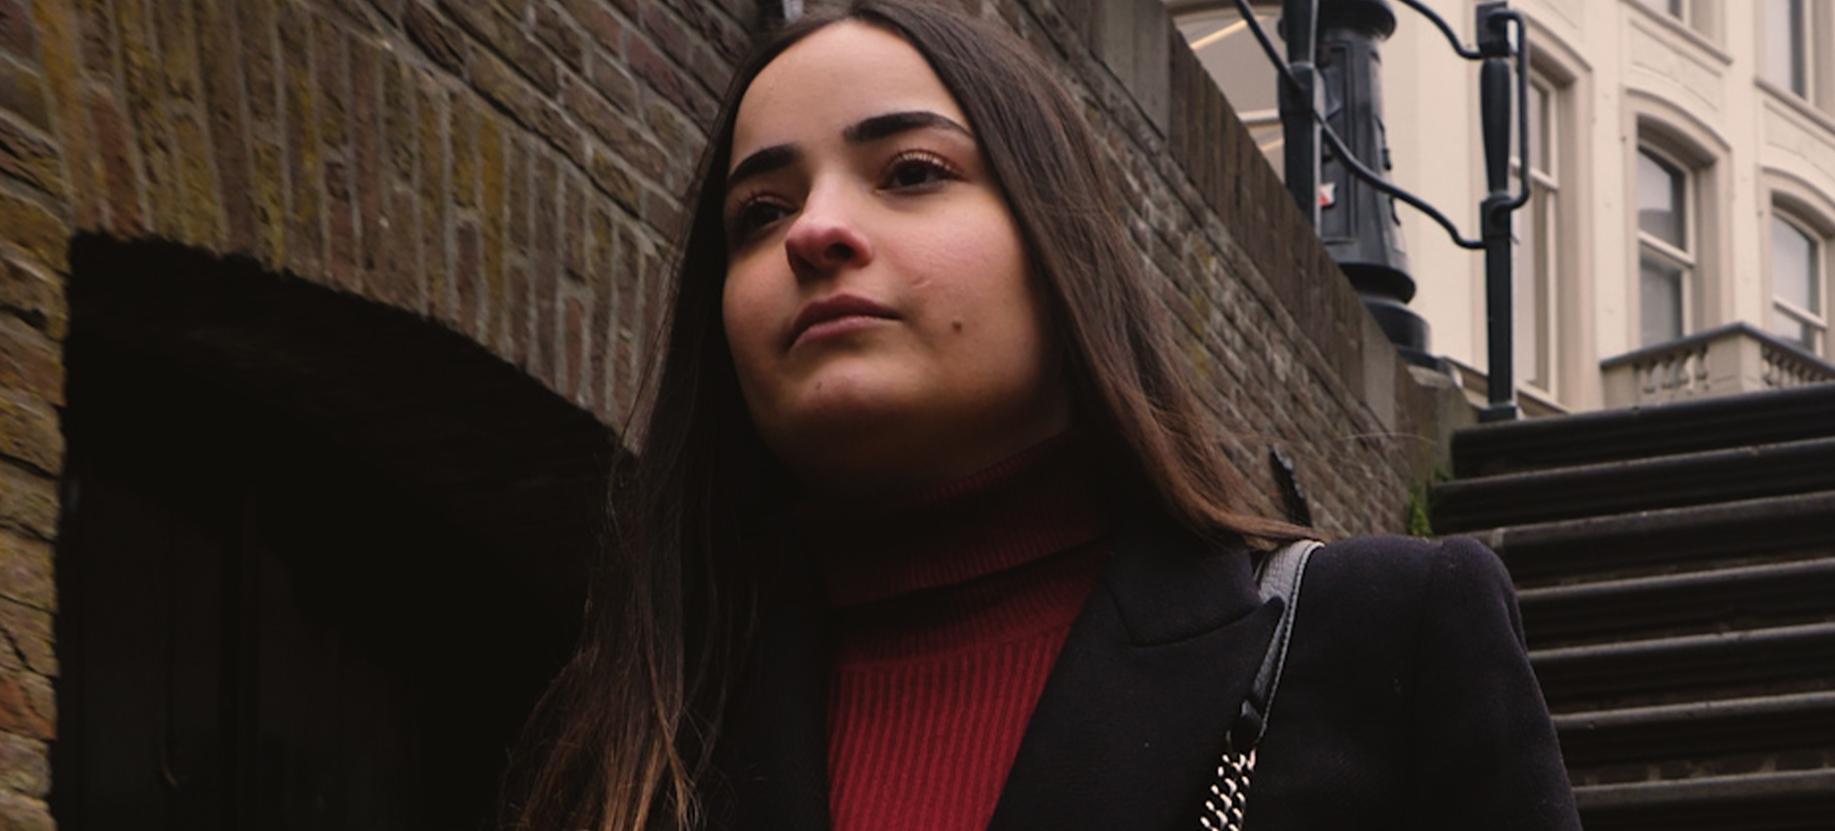 Filiz (19) maakt kleding van afval